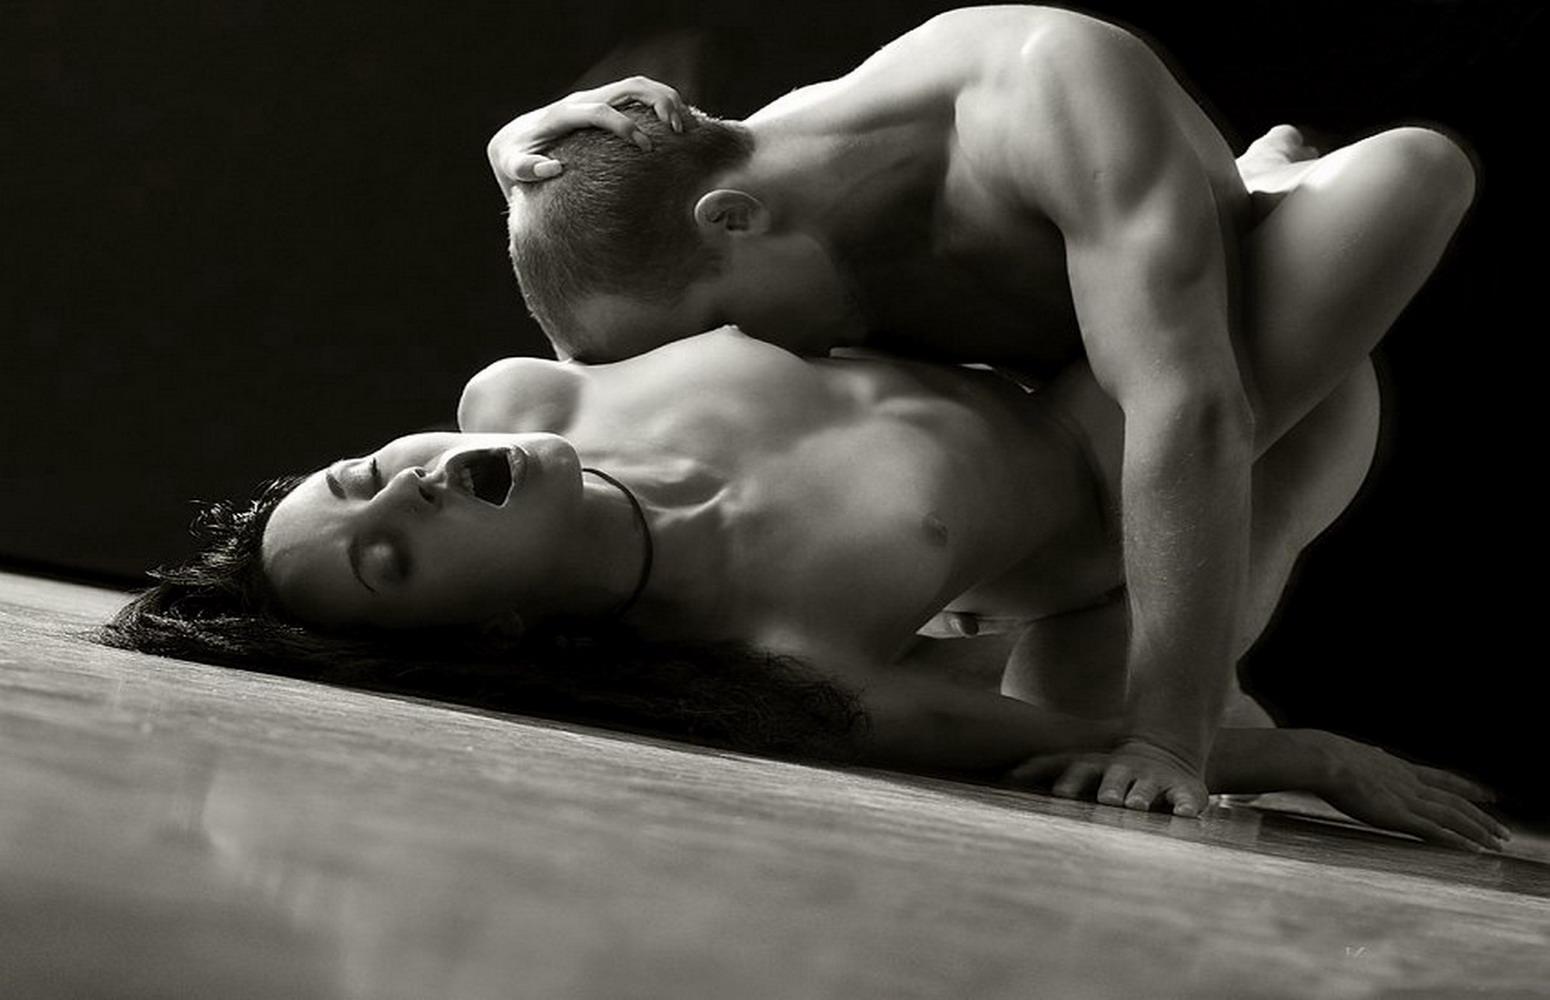 Master shakes nude love